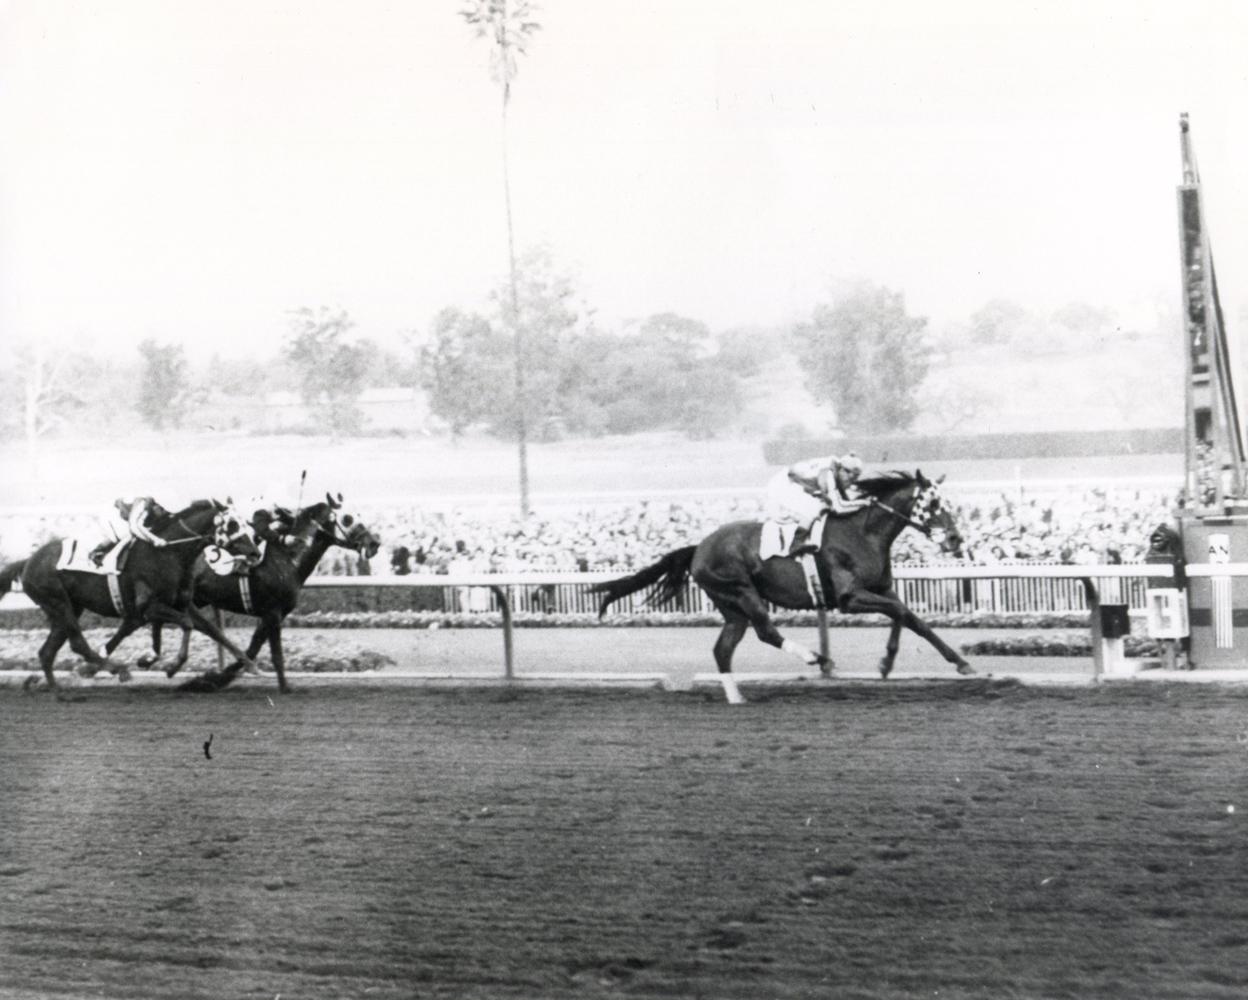 Hill Prince (Eddie Arcaro up) winning the 1952 San Marcos Handicap at Santa Anita (The BloodHorse/Museum Collection)